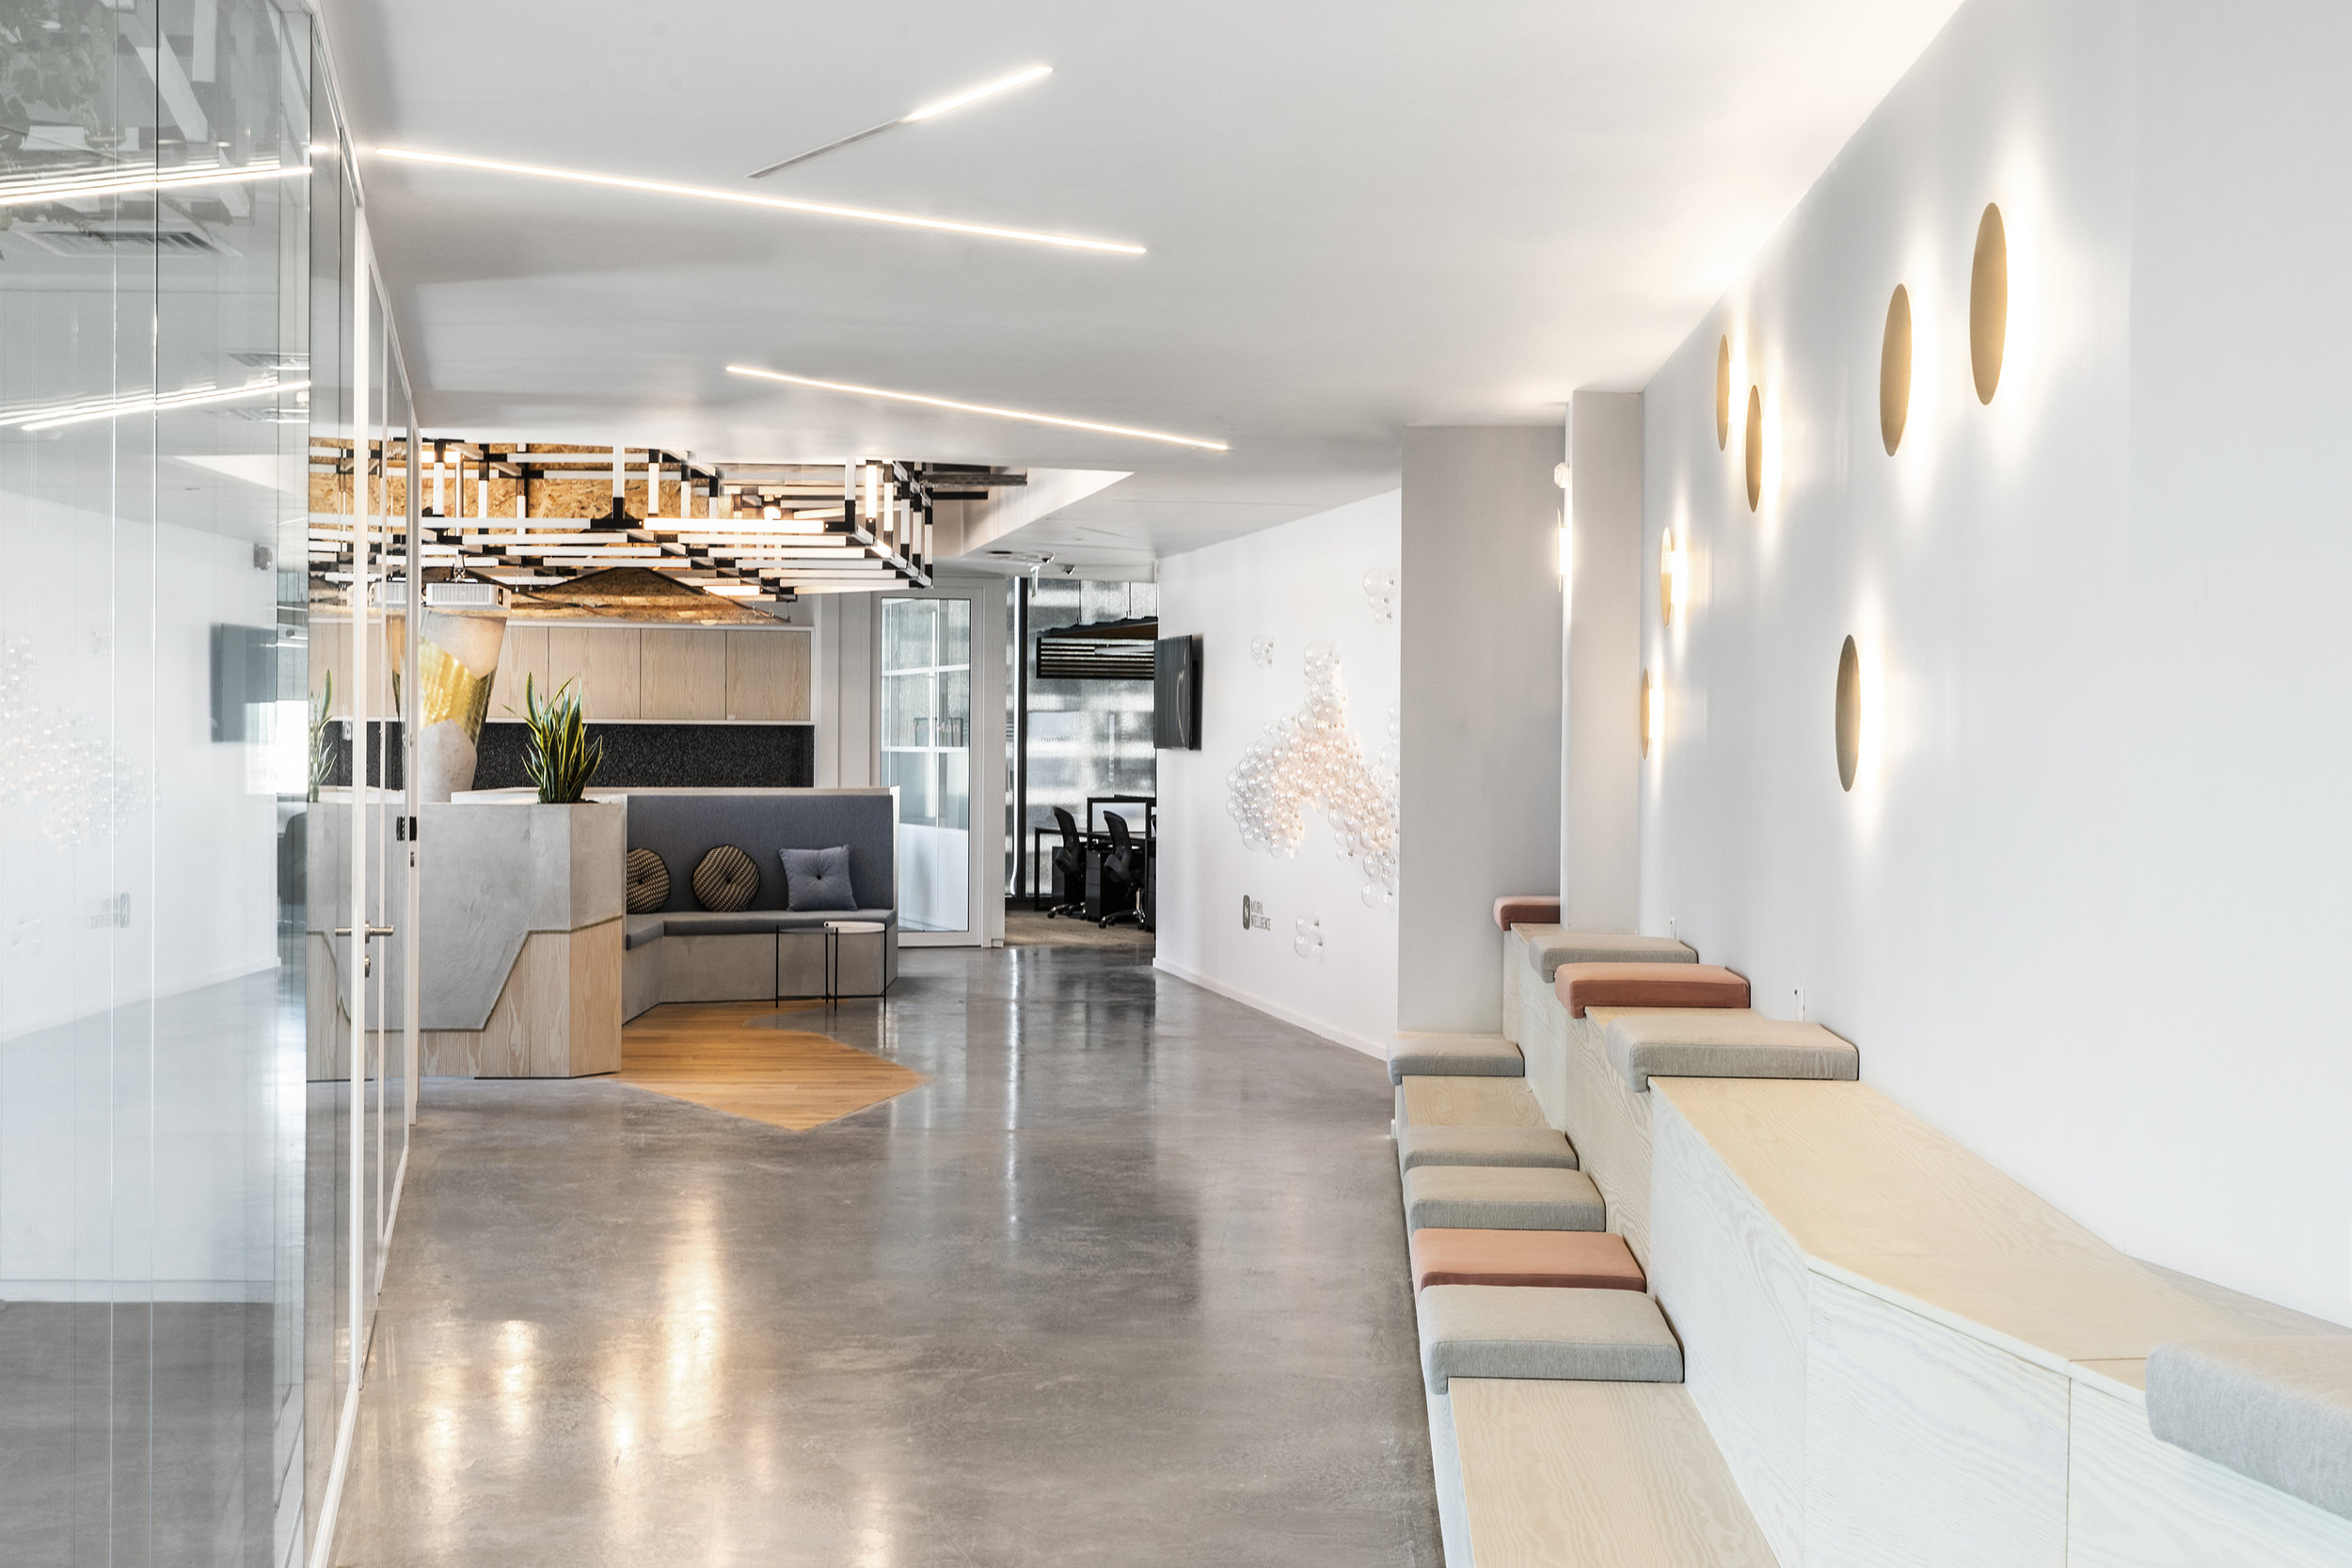 רואי דוד אדריכלות - אדריכל - נטורל אינטליג'נס - ROY DAVID - ARCHITECTURE - ARCHITECT - NI (70).jpg